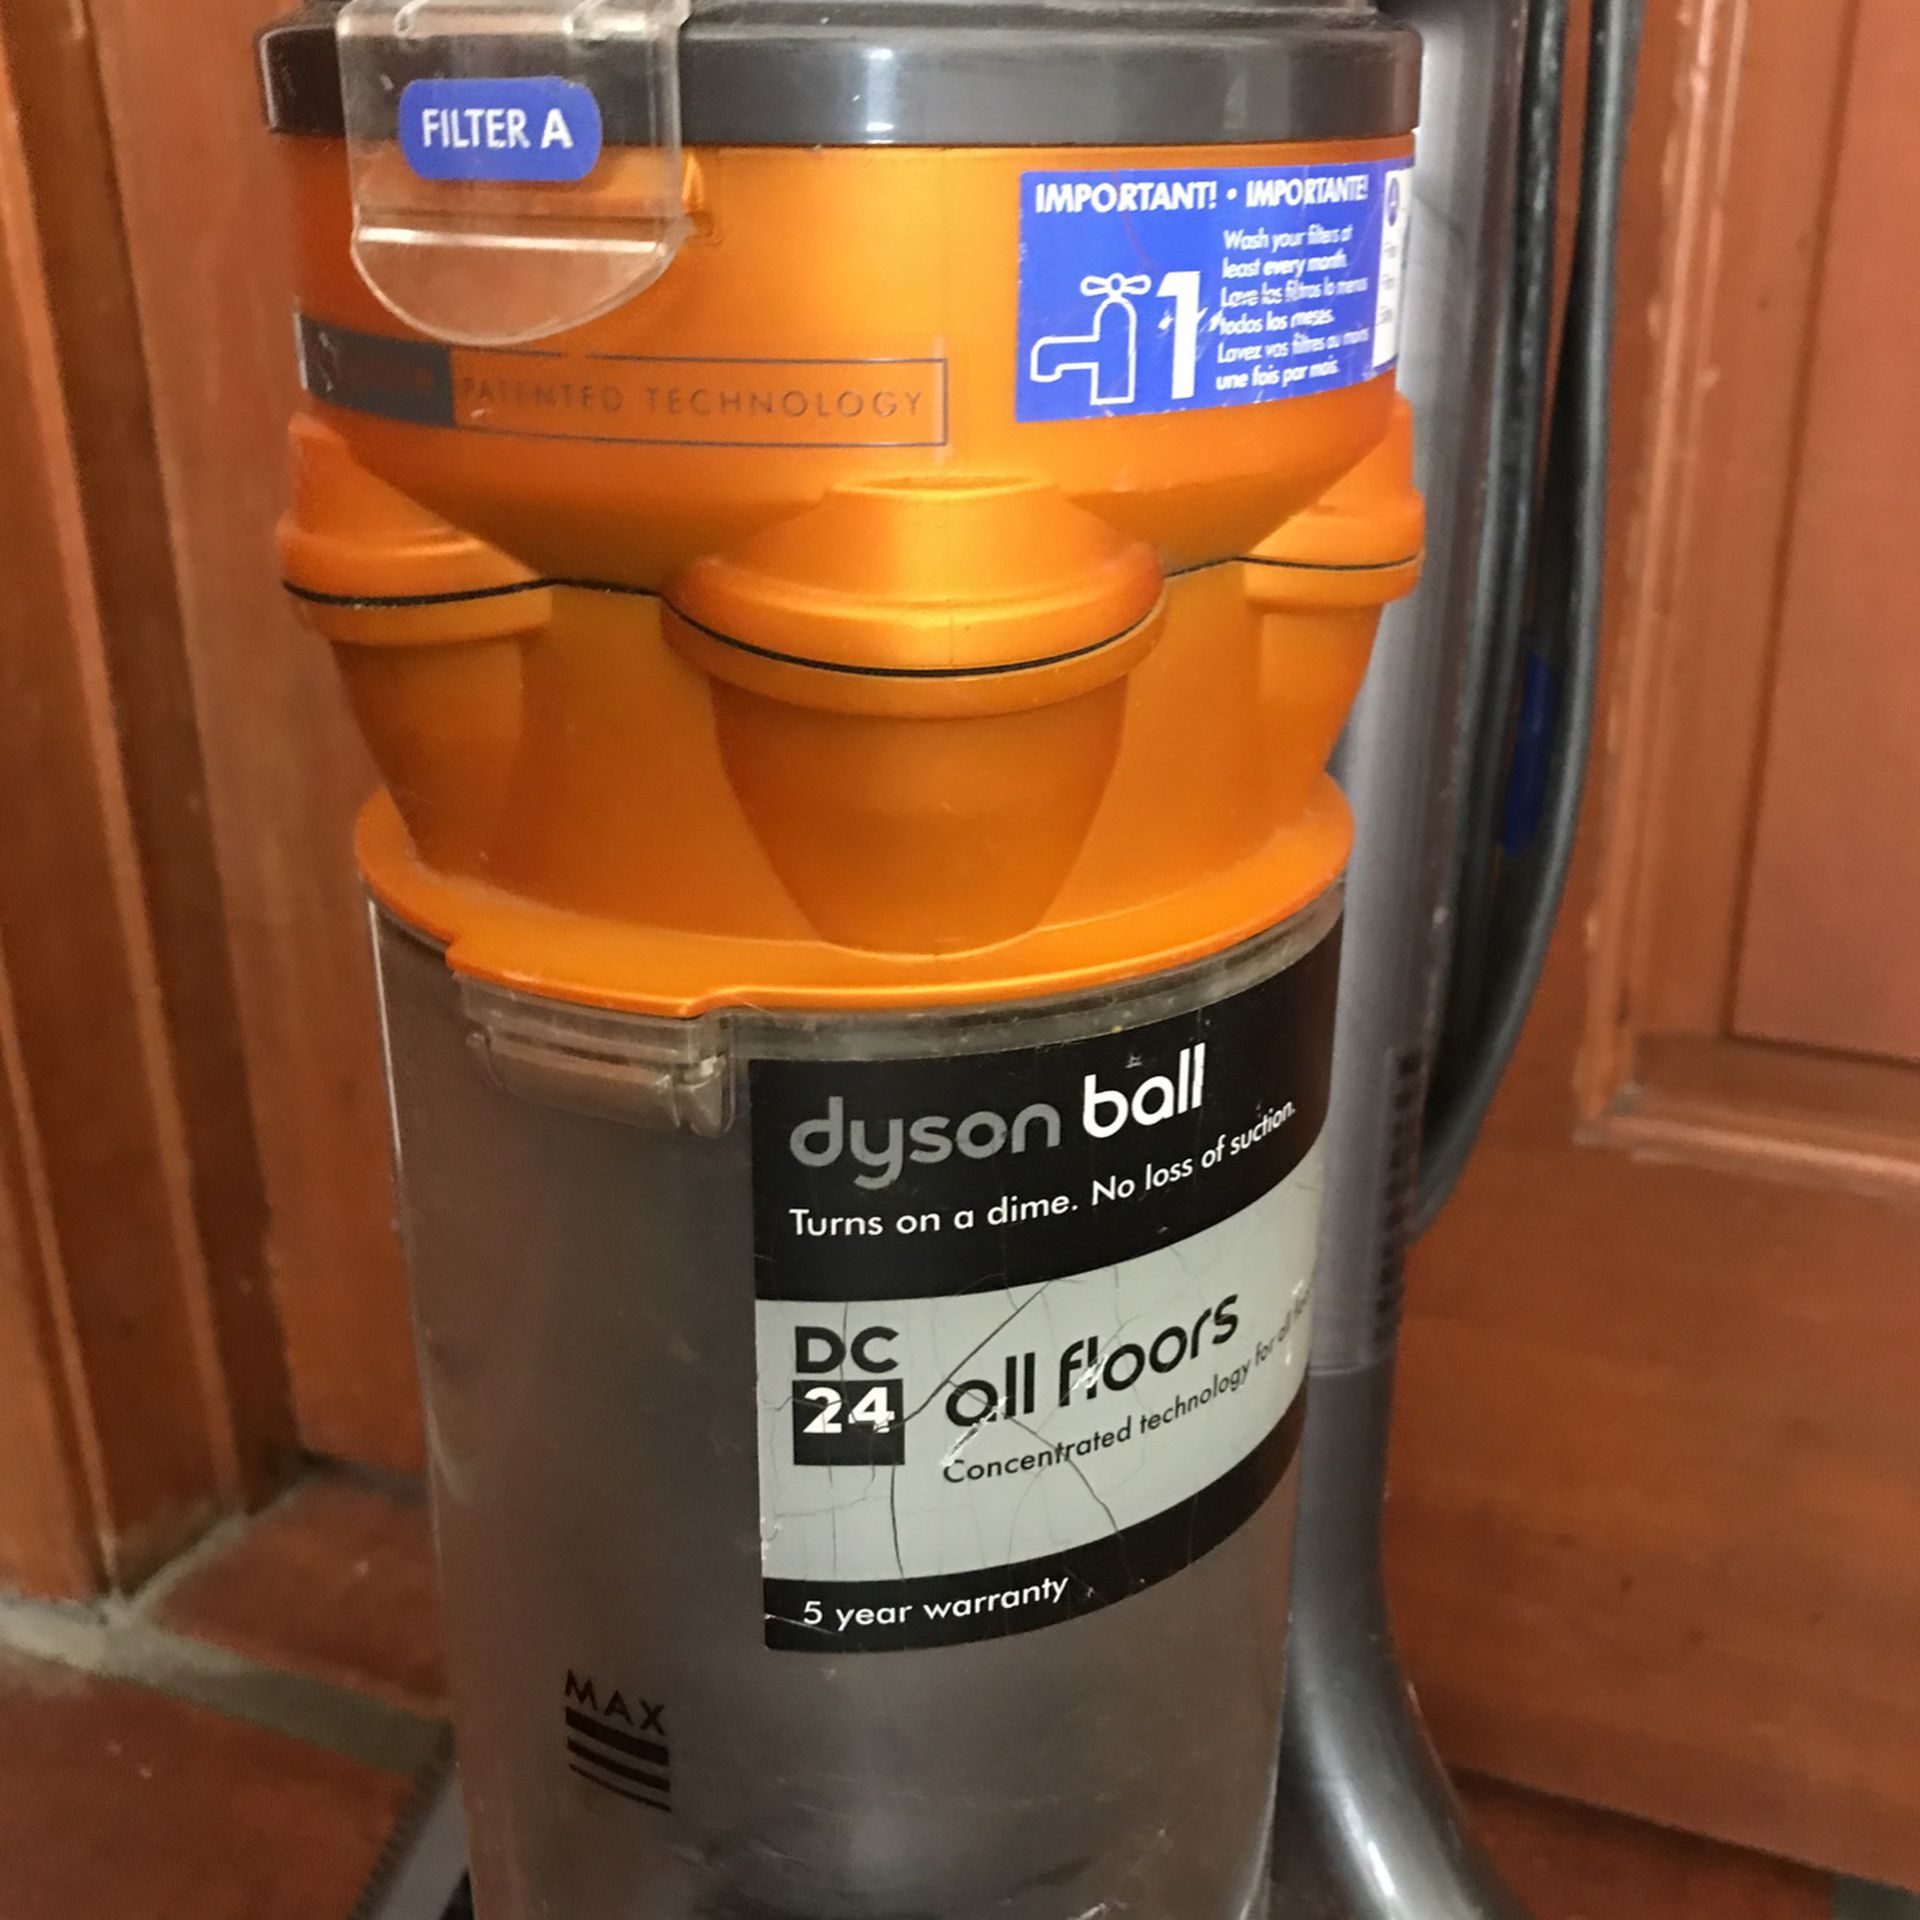 dyson ball DC24 vaccum